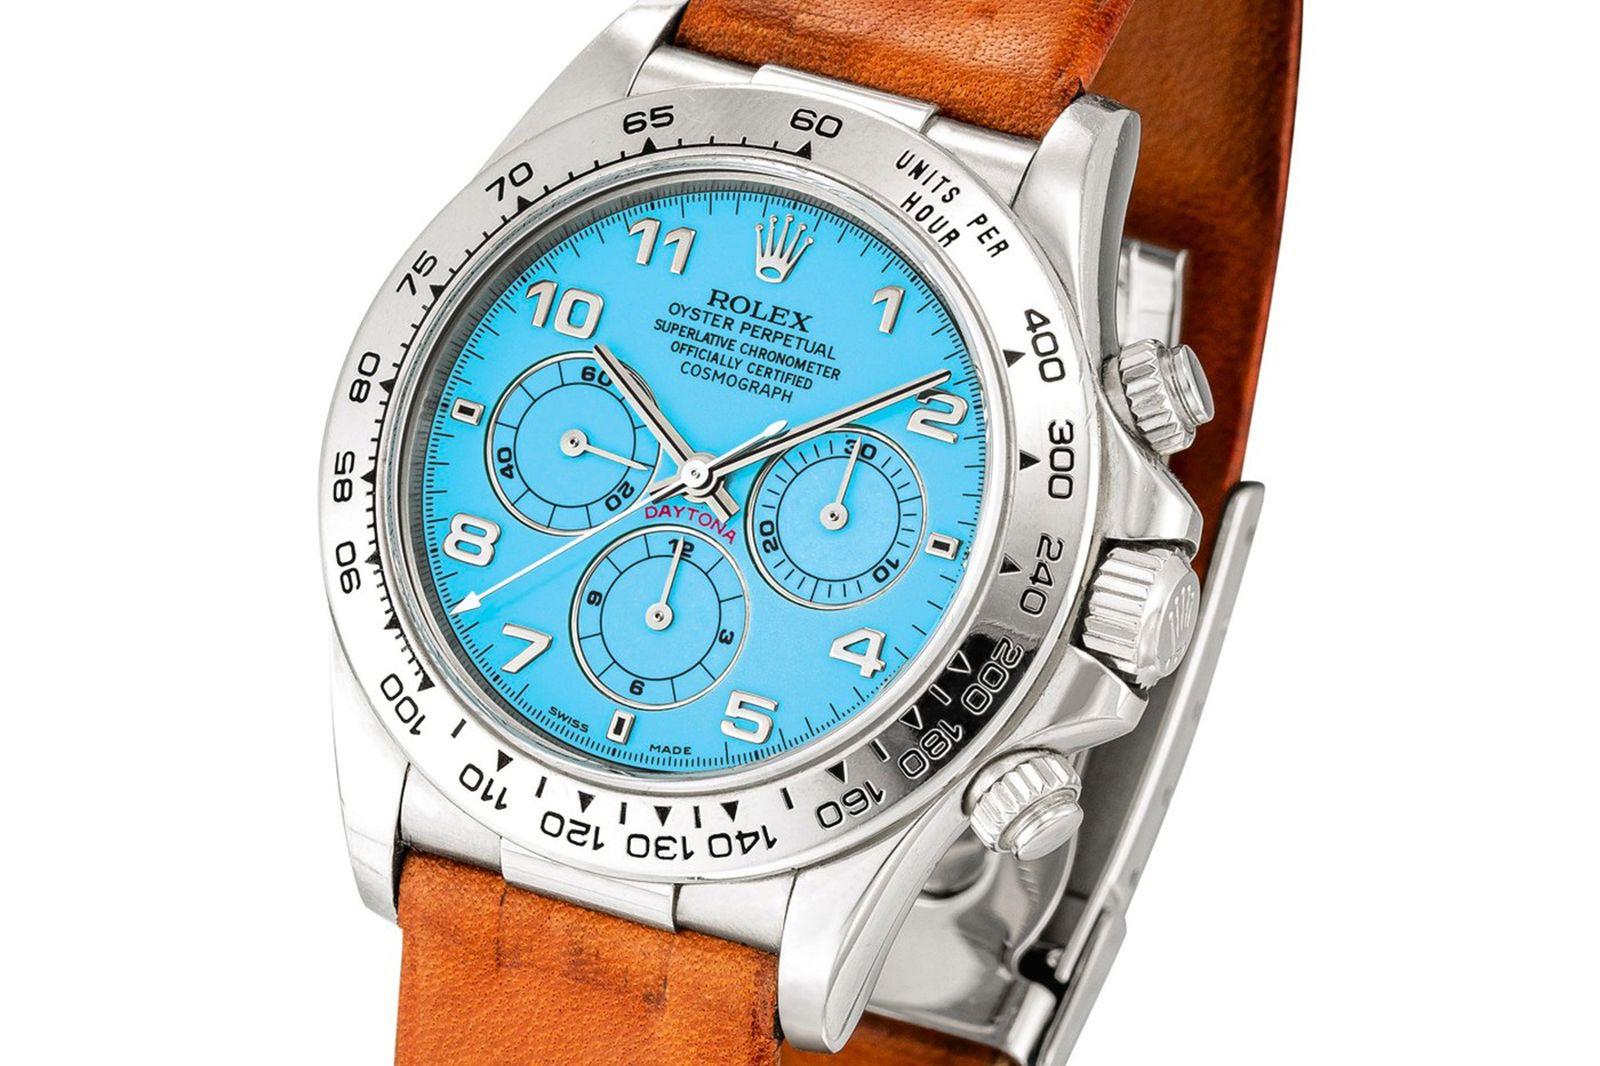 rolex-zenith-daytona-turquoise-dial-auction-01